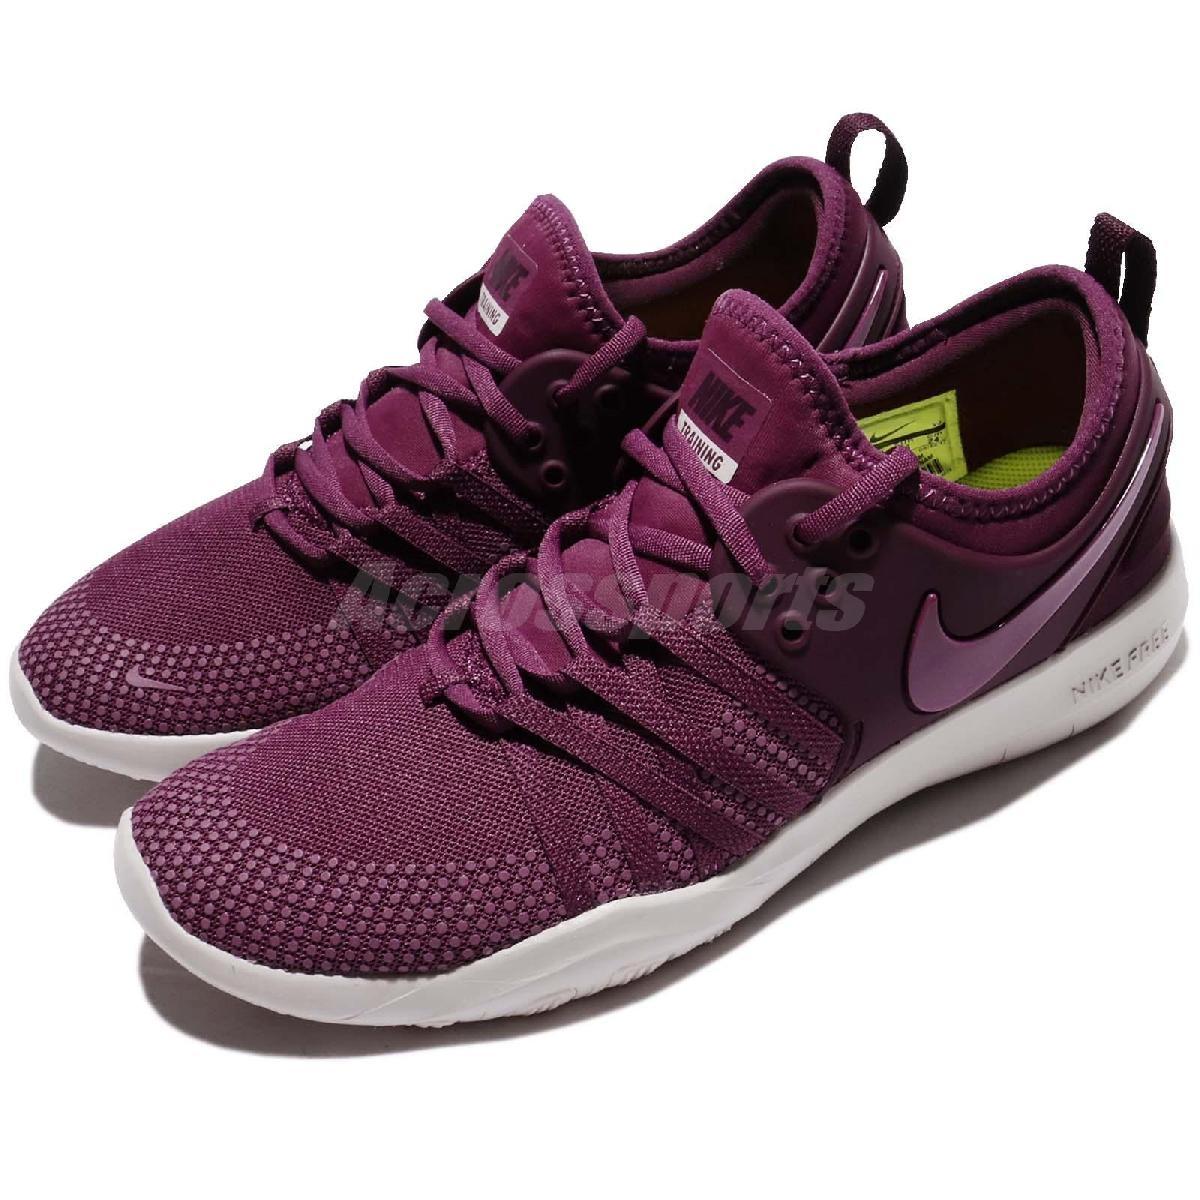 Nike 訓練鞋 Wmns Nike Free TR 7 紫 粉紅 赤足 運動鞋 輕量舒適 女鞋【PUMP306】 904651-603